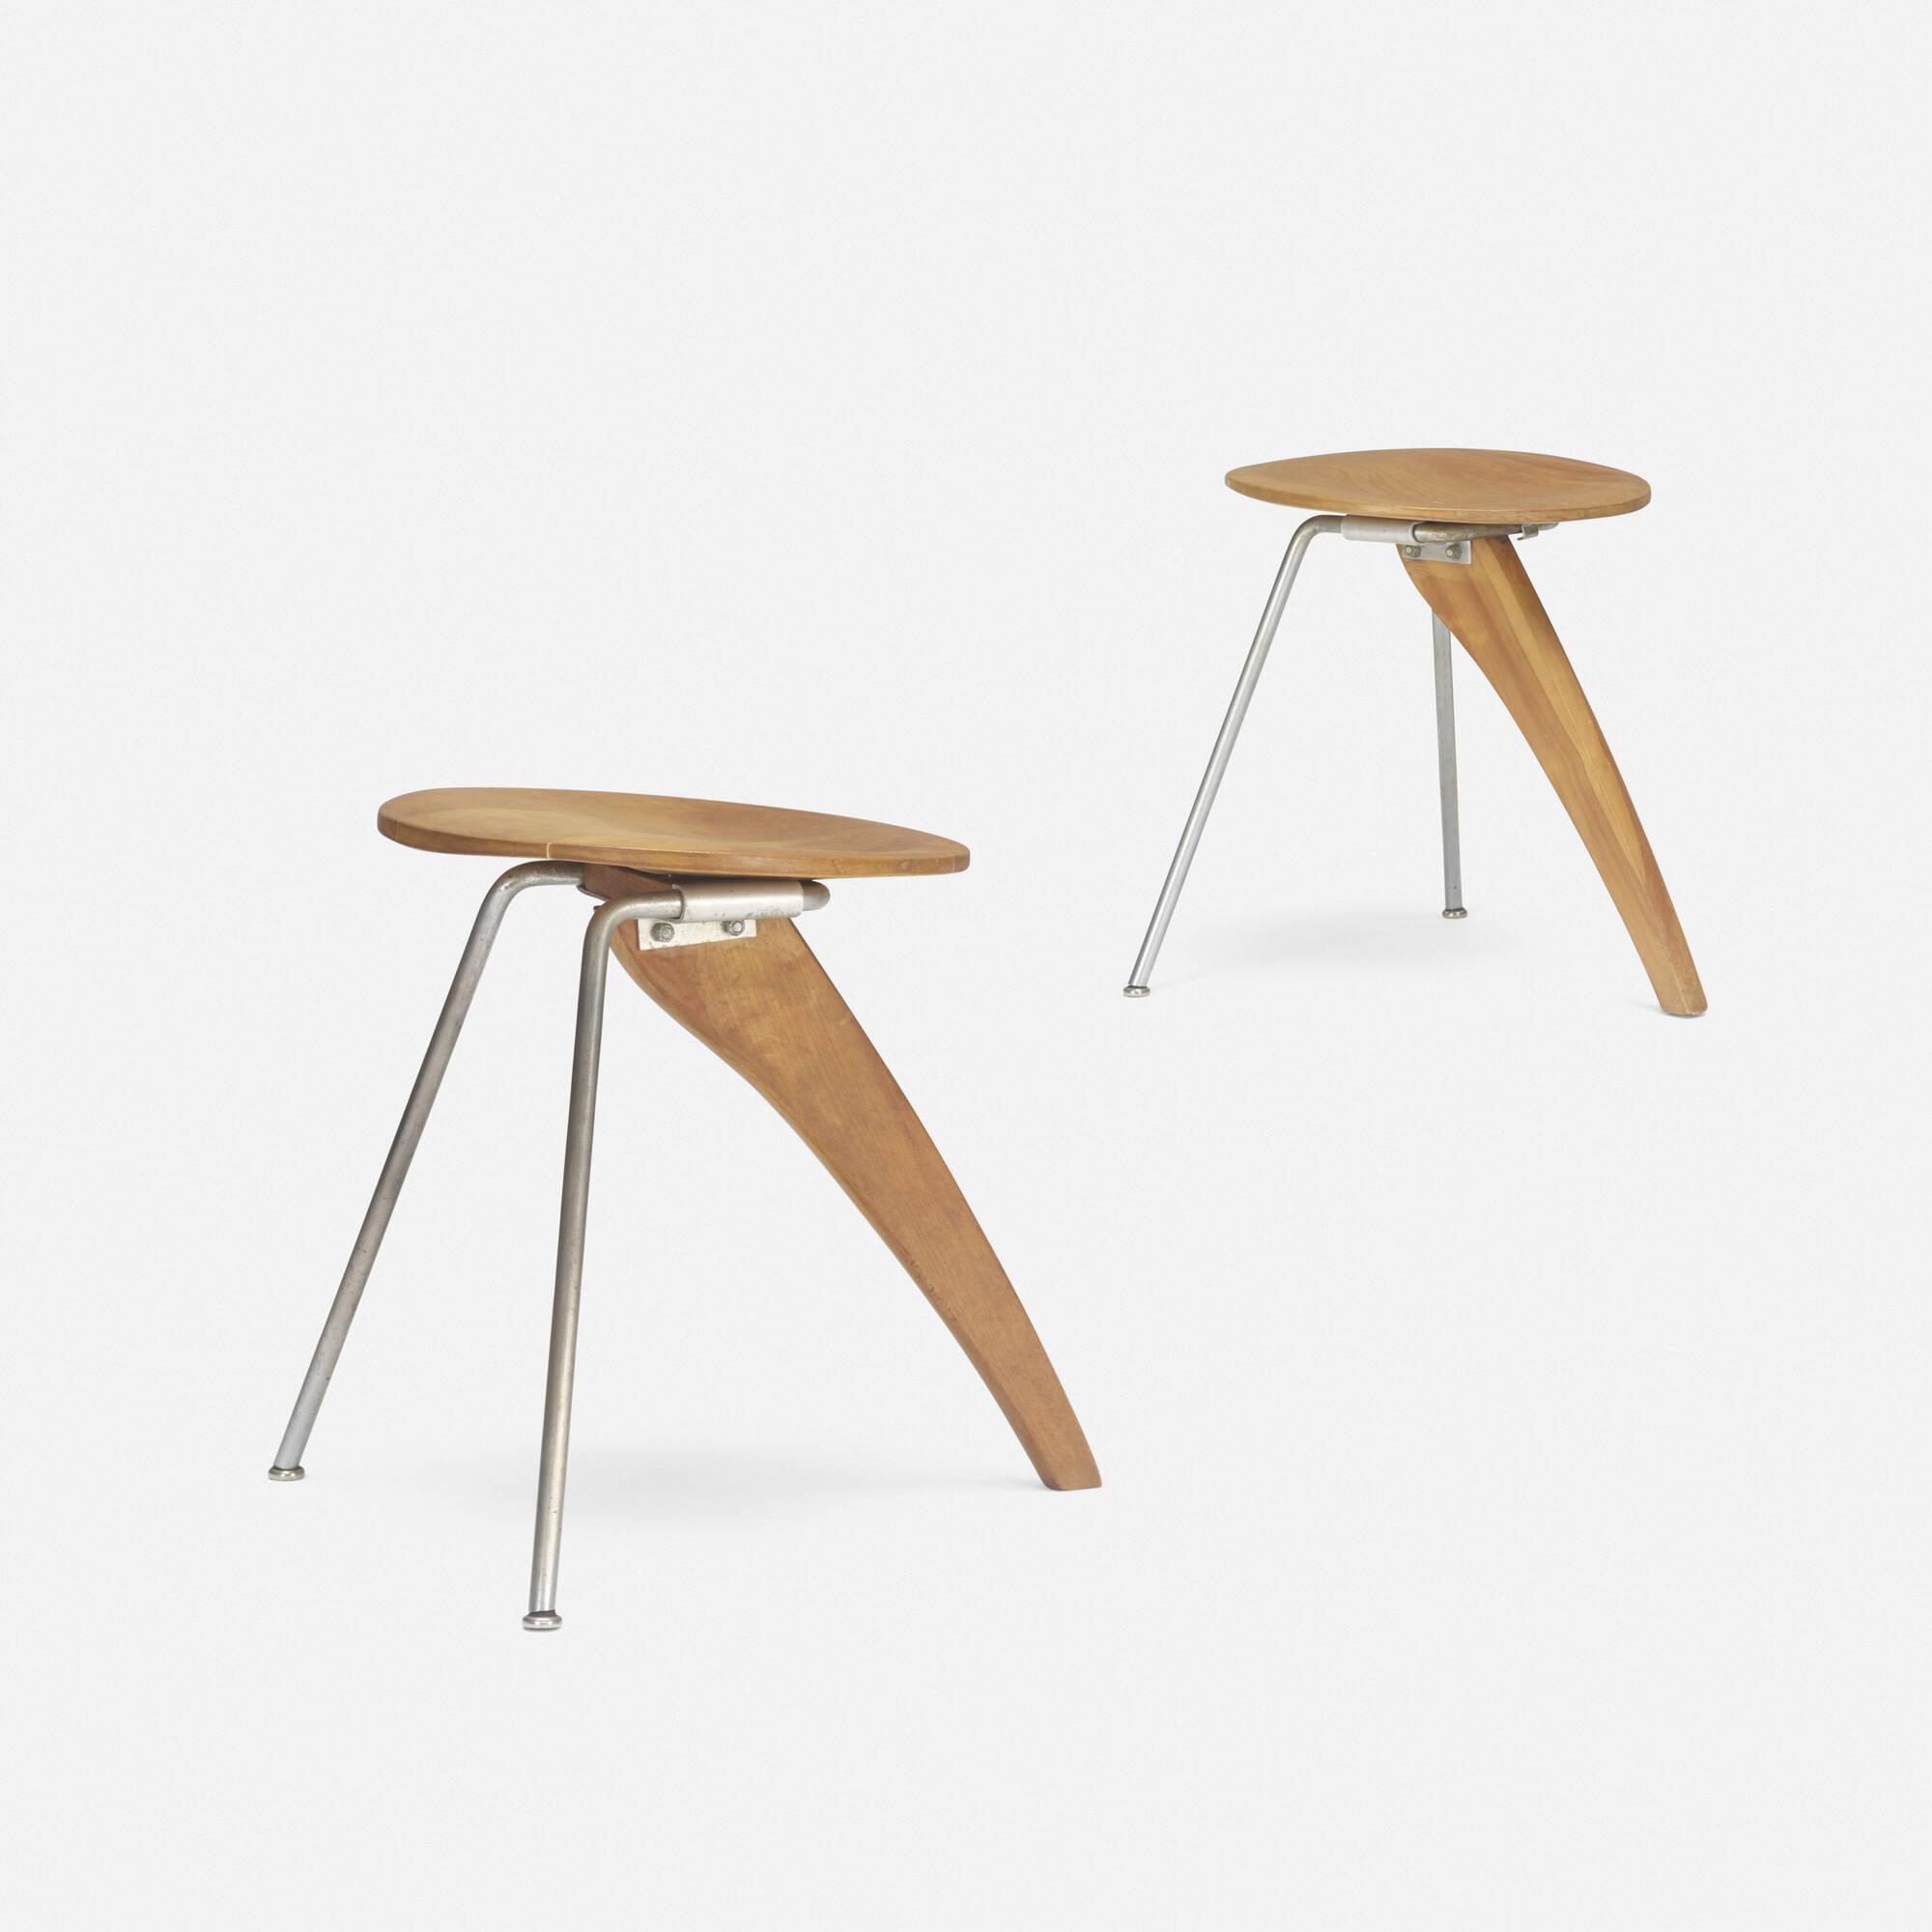 190: Isamu Noguchi / Rudder Stools Model IN 22, Pair (1 Of